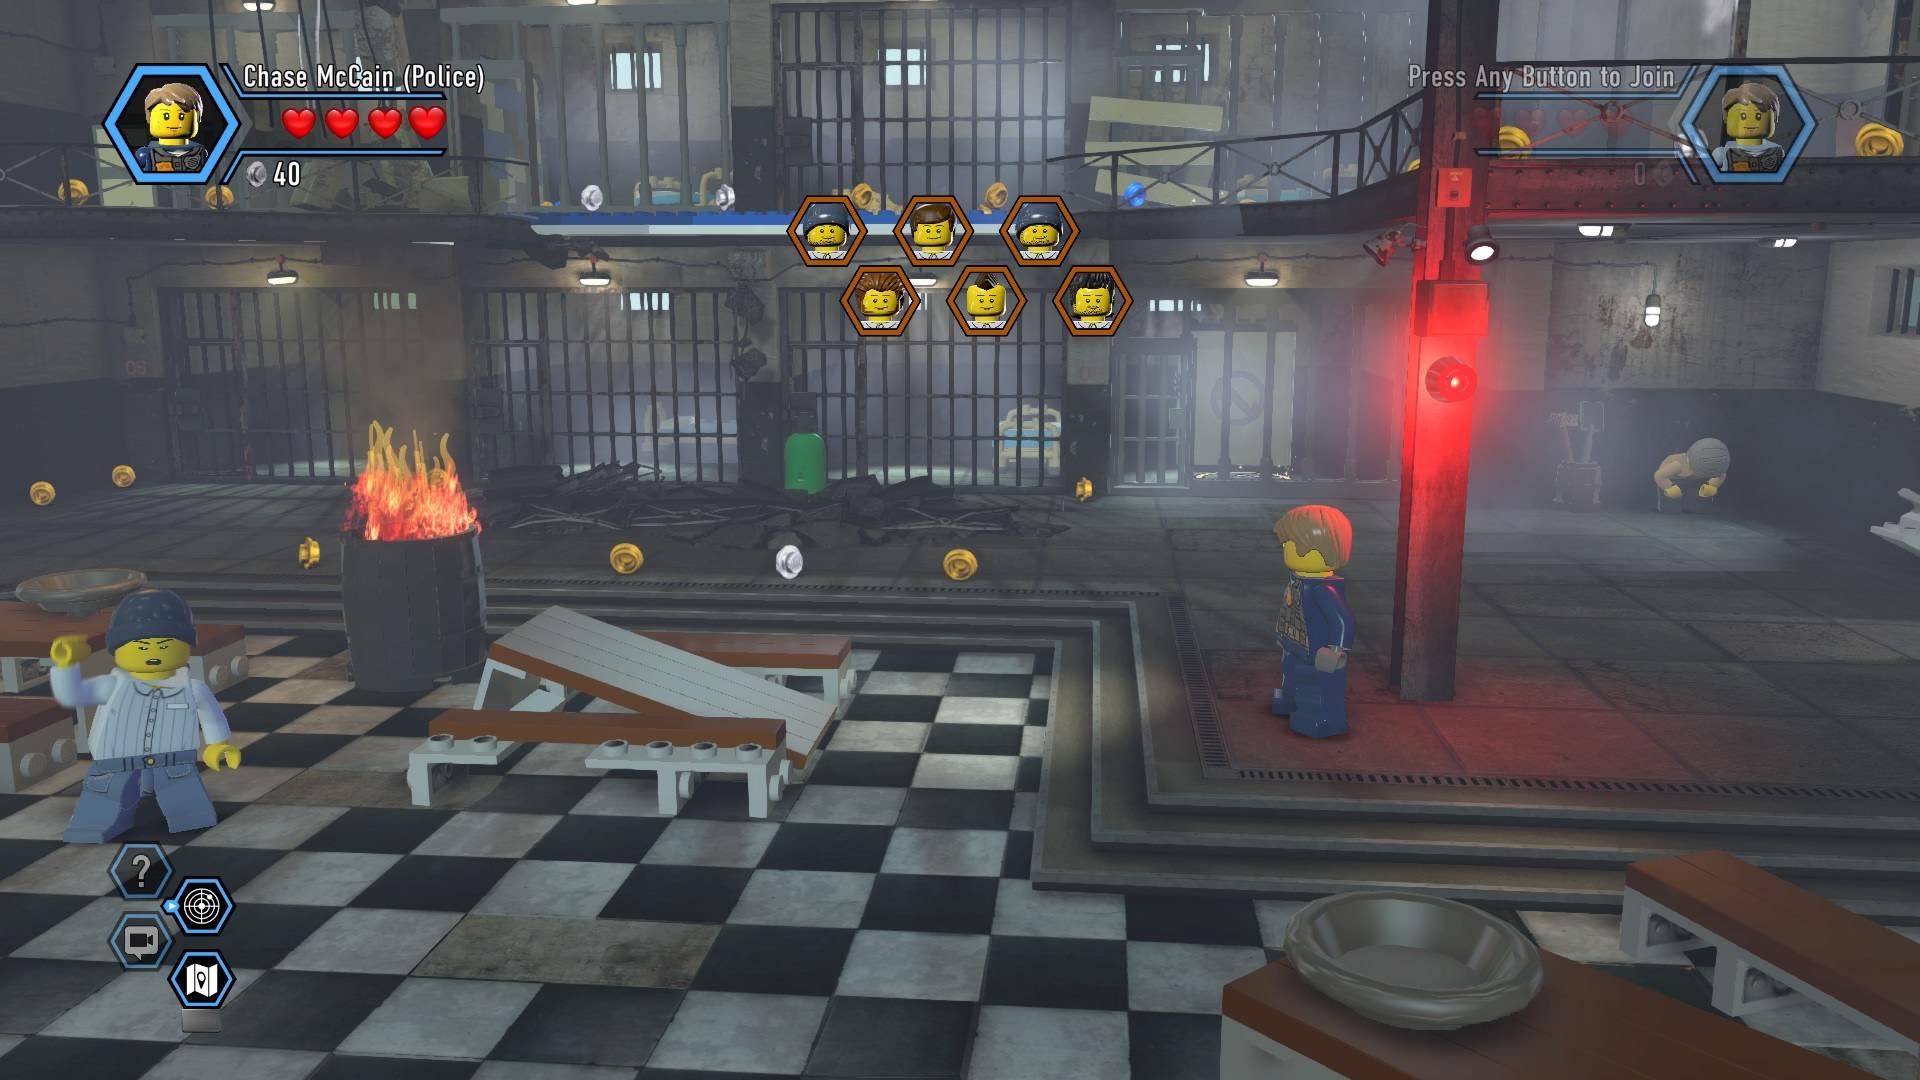 LEGO City Undercover Walkthrough Chapter 3 Guide Albatross Prison Island Walkthroughs